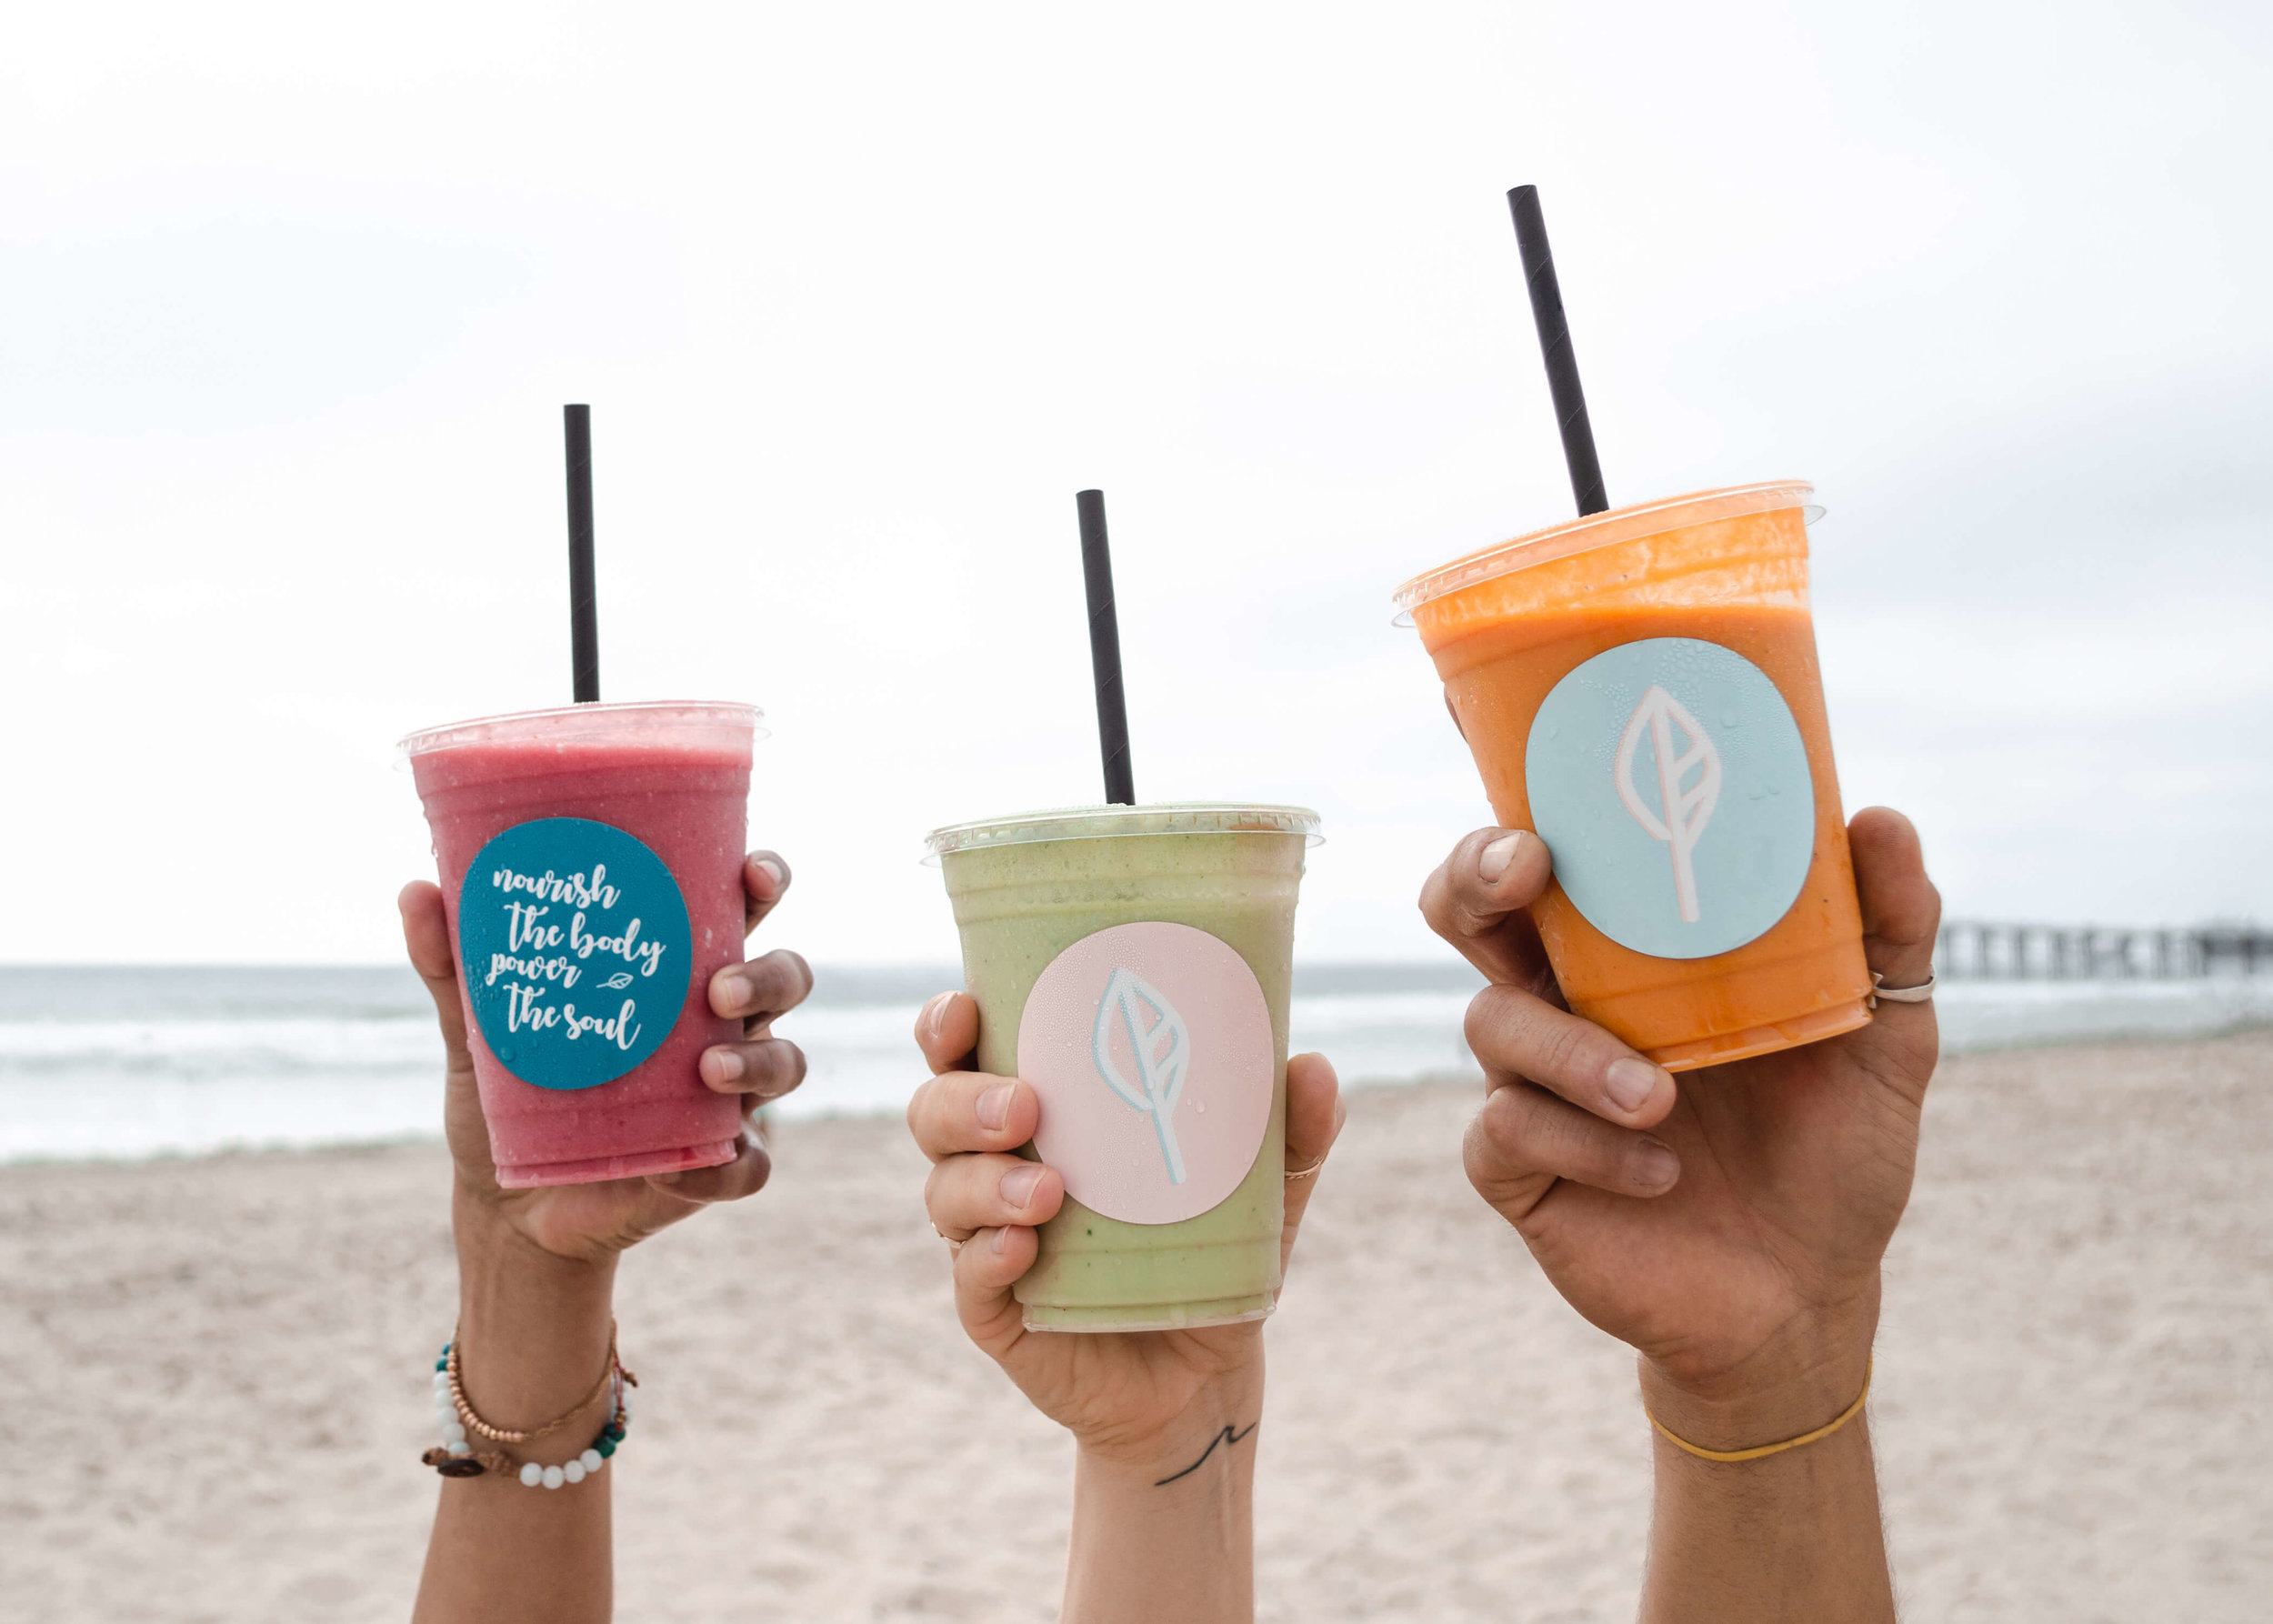 Superfood-smoothies-pacific-beach needs geotag 2.jpg